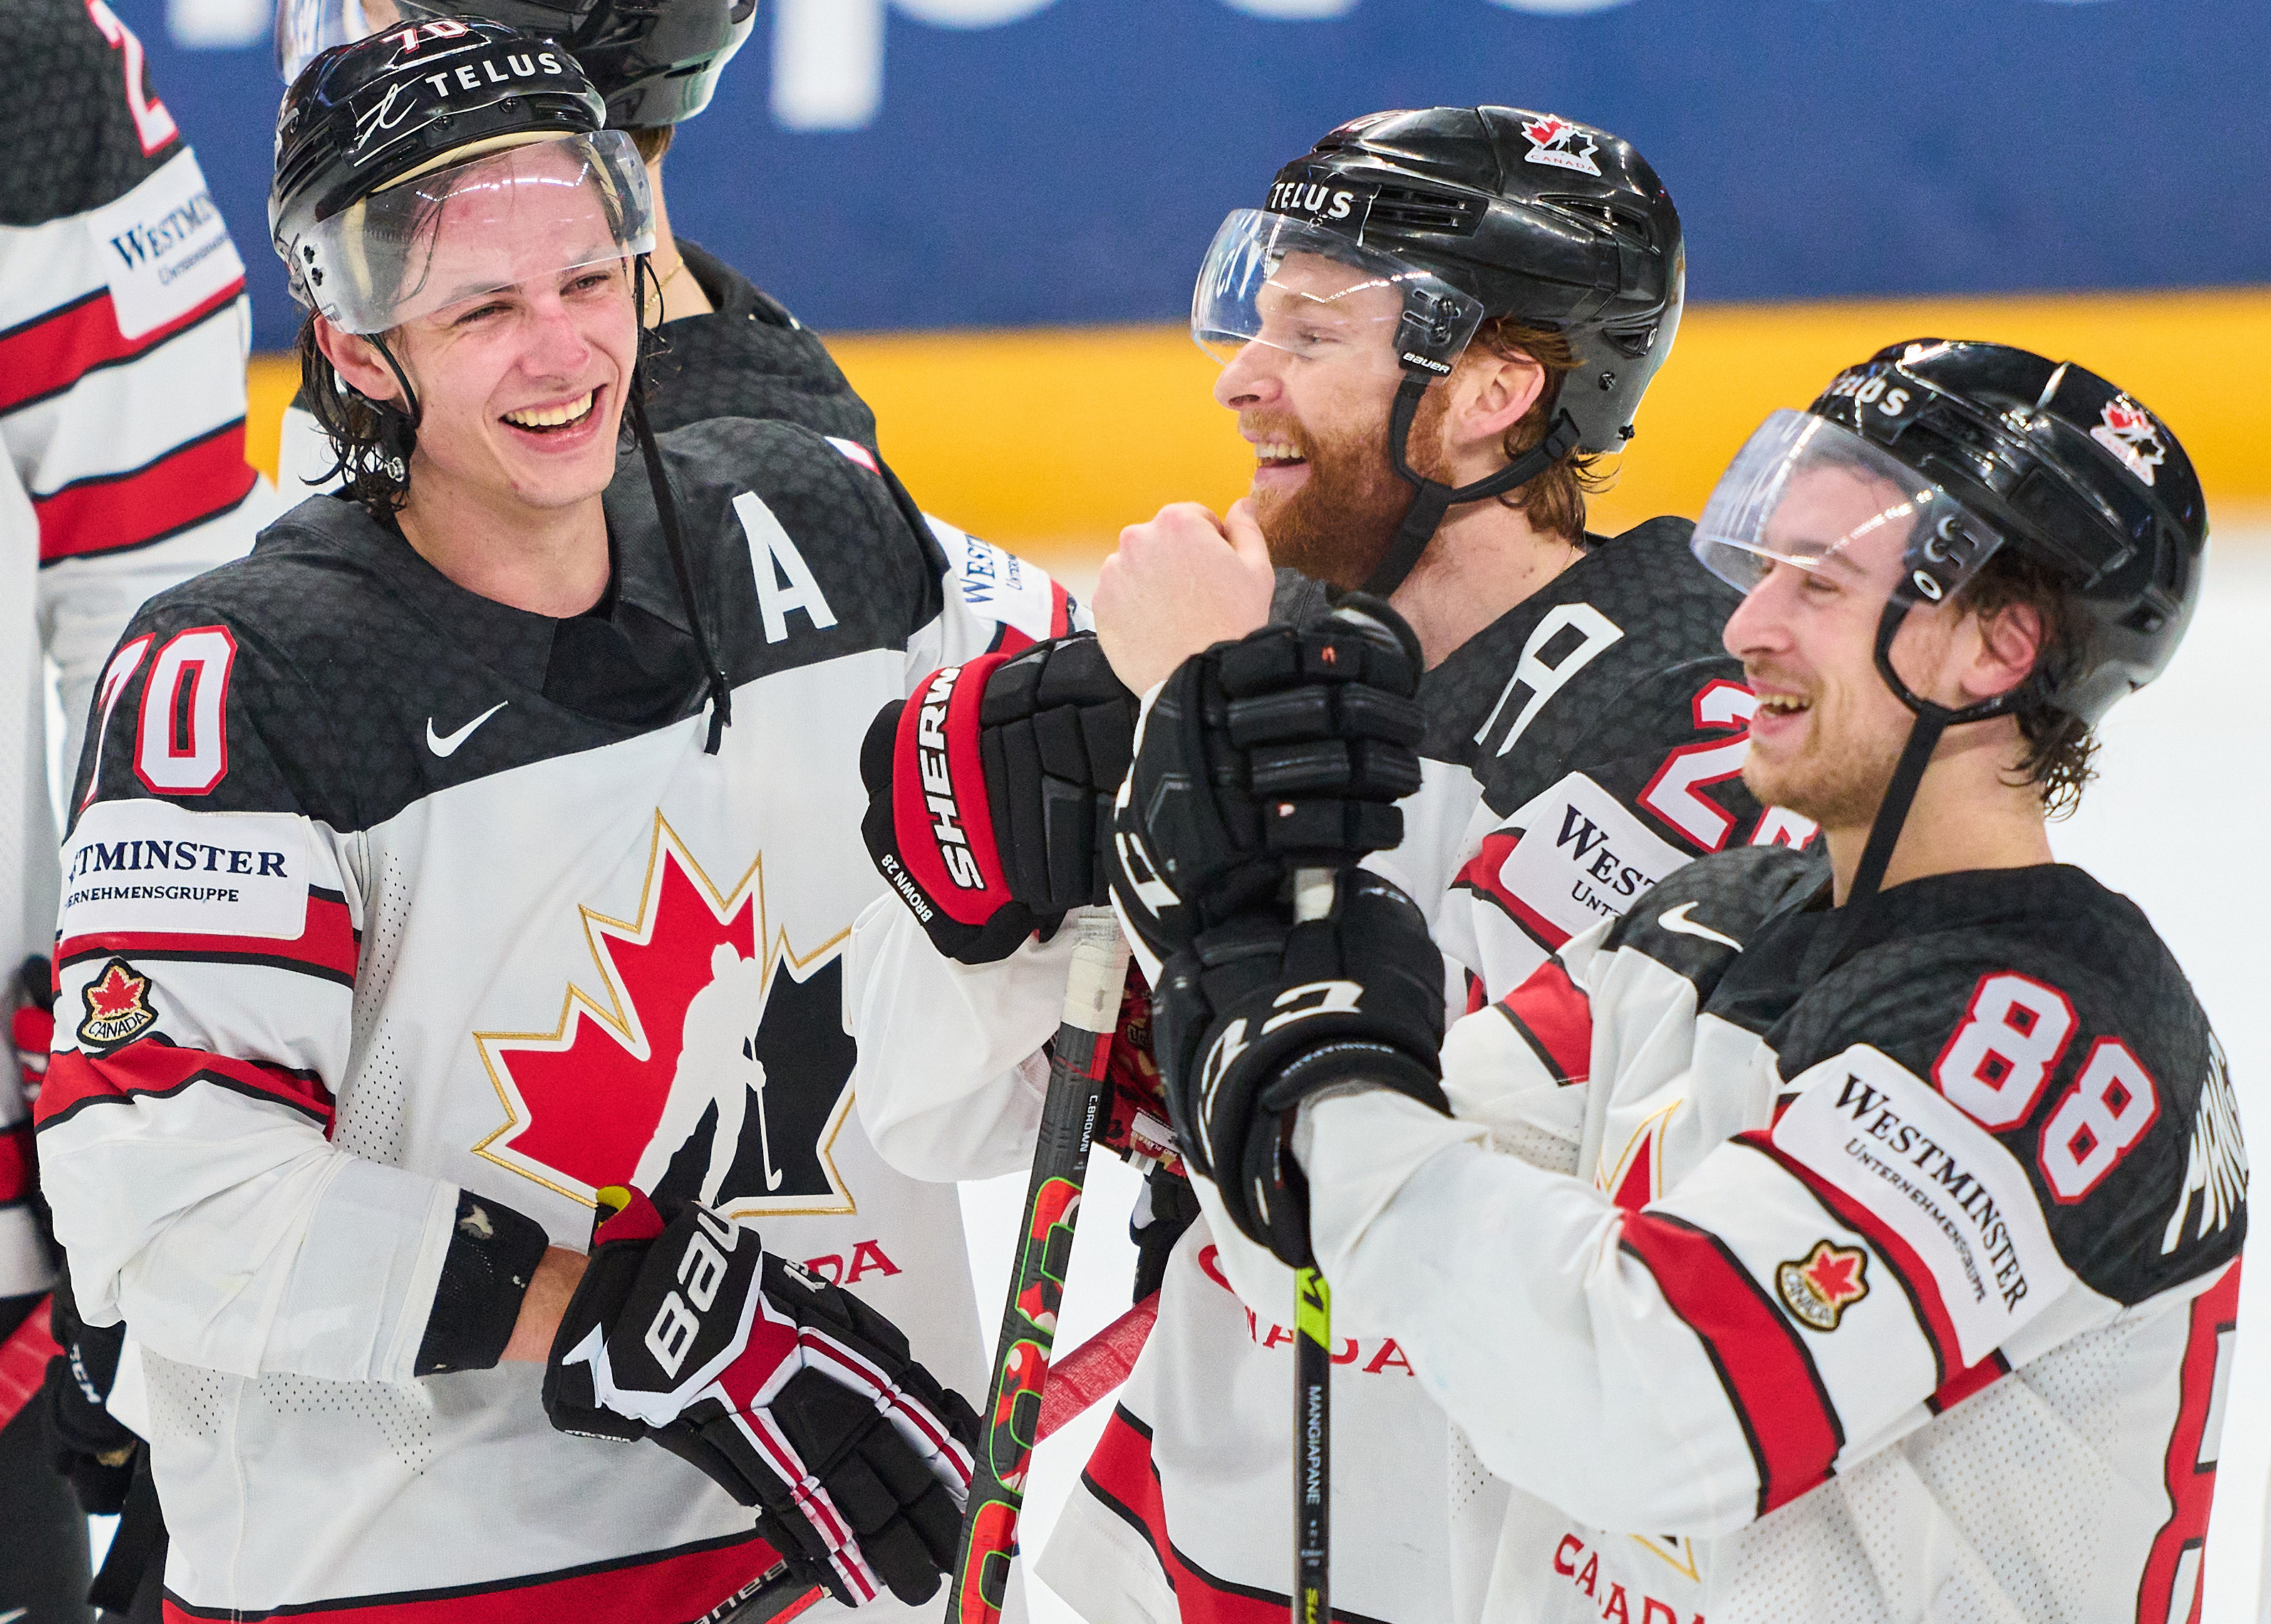 USA v Canada - 2021 IIHF Ice Hockey World Championship Semi Final